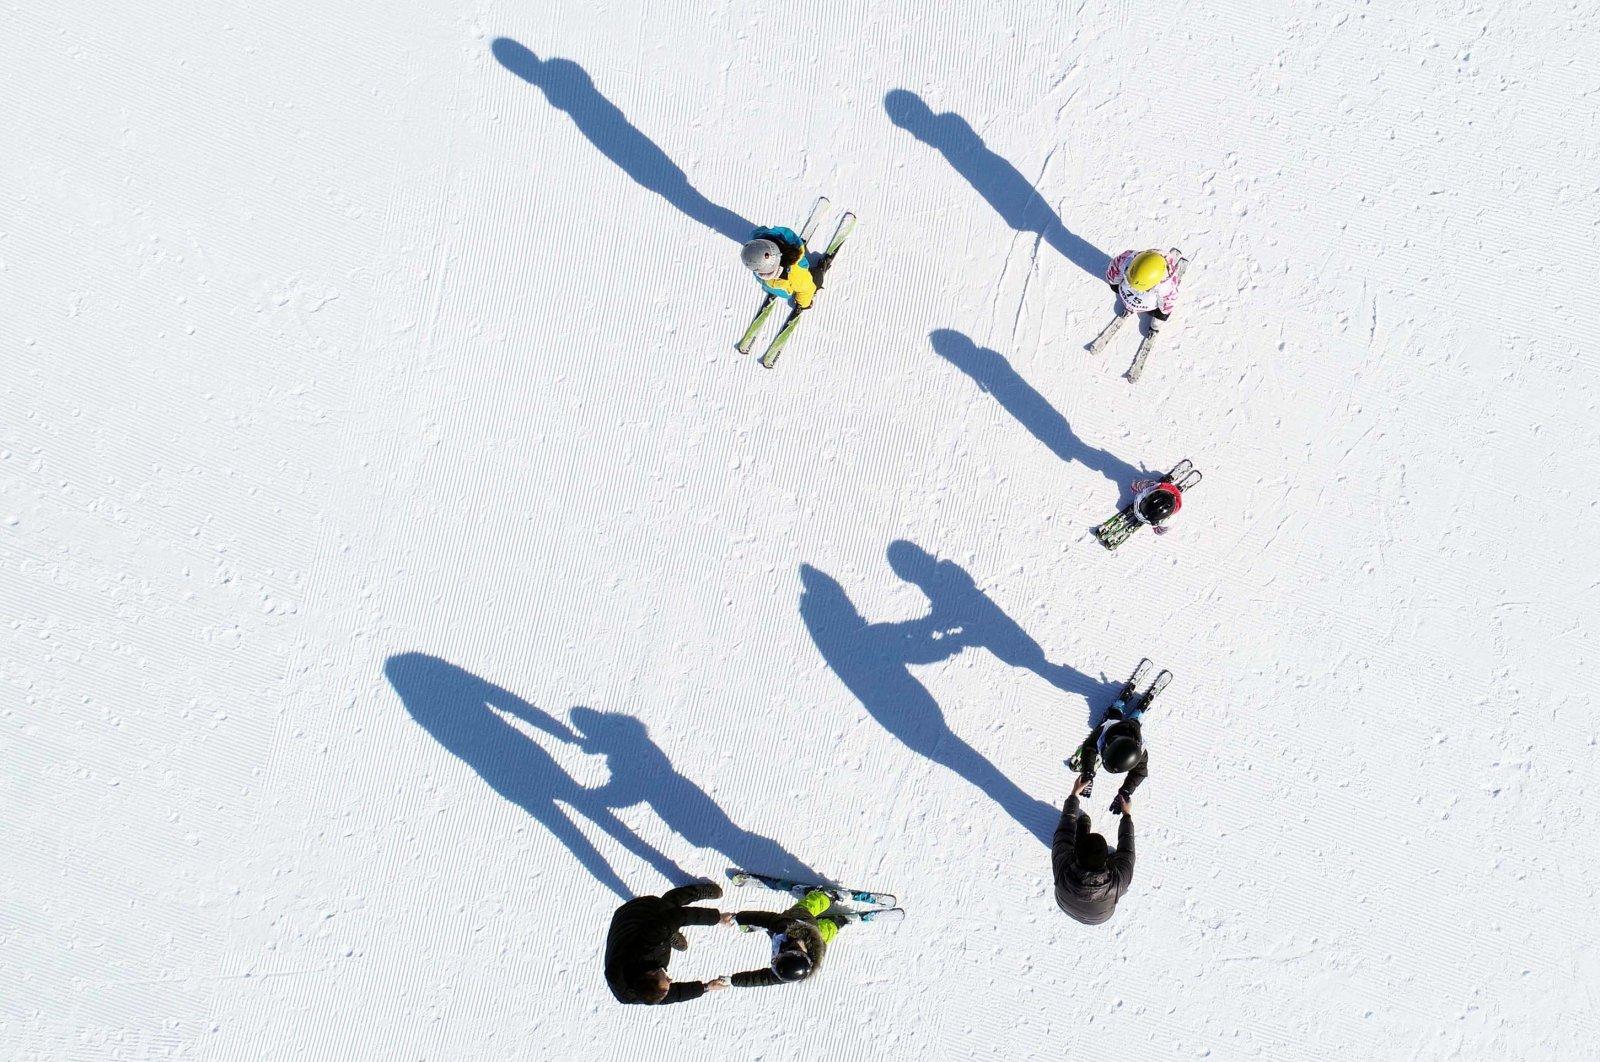 Kids receive skiing lessons from instructors at Palandöken Ski resort in Erzurum, eastern Turkey. (AA Photo)